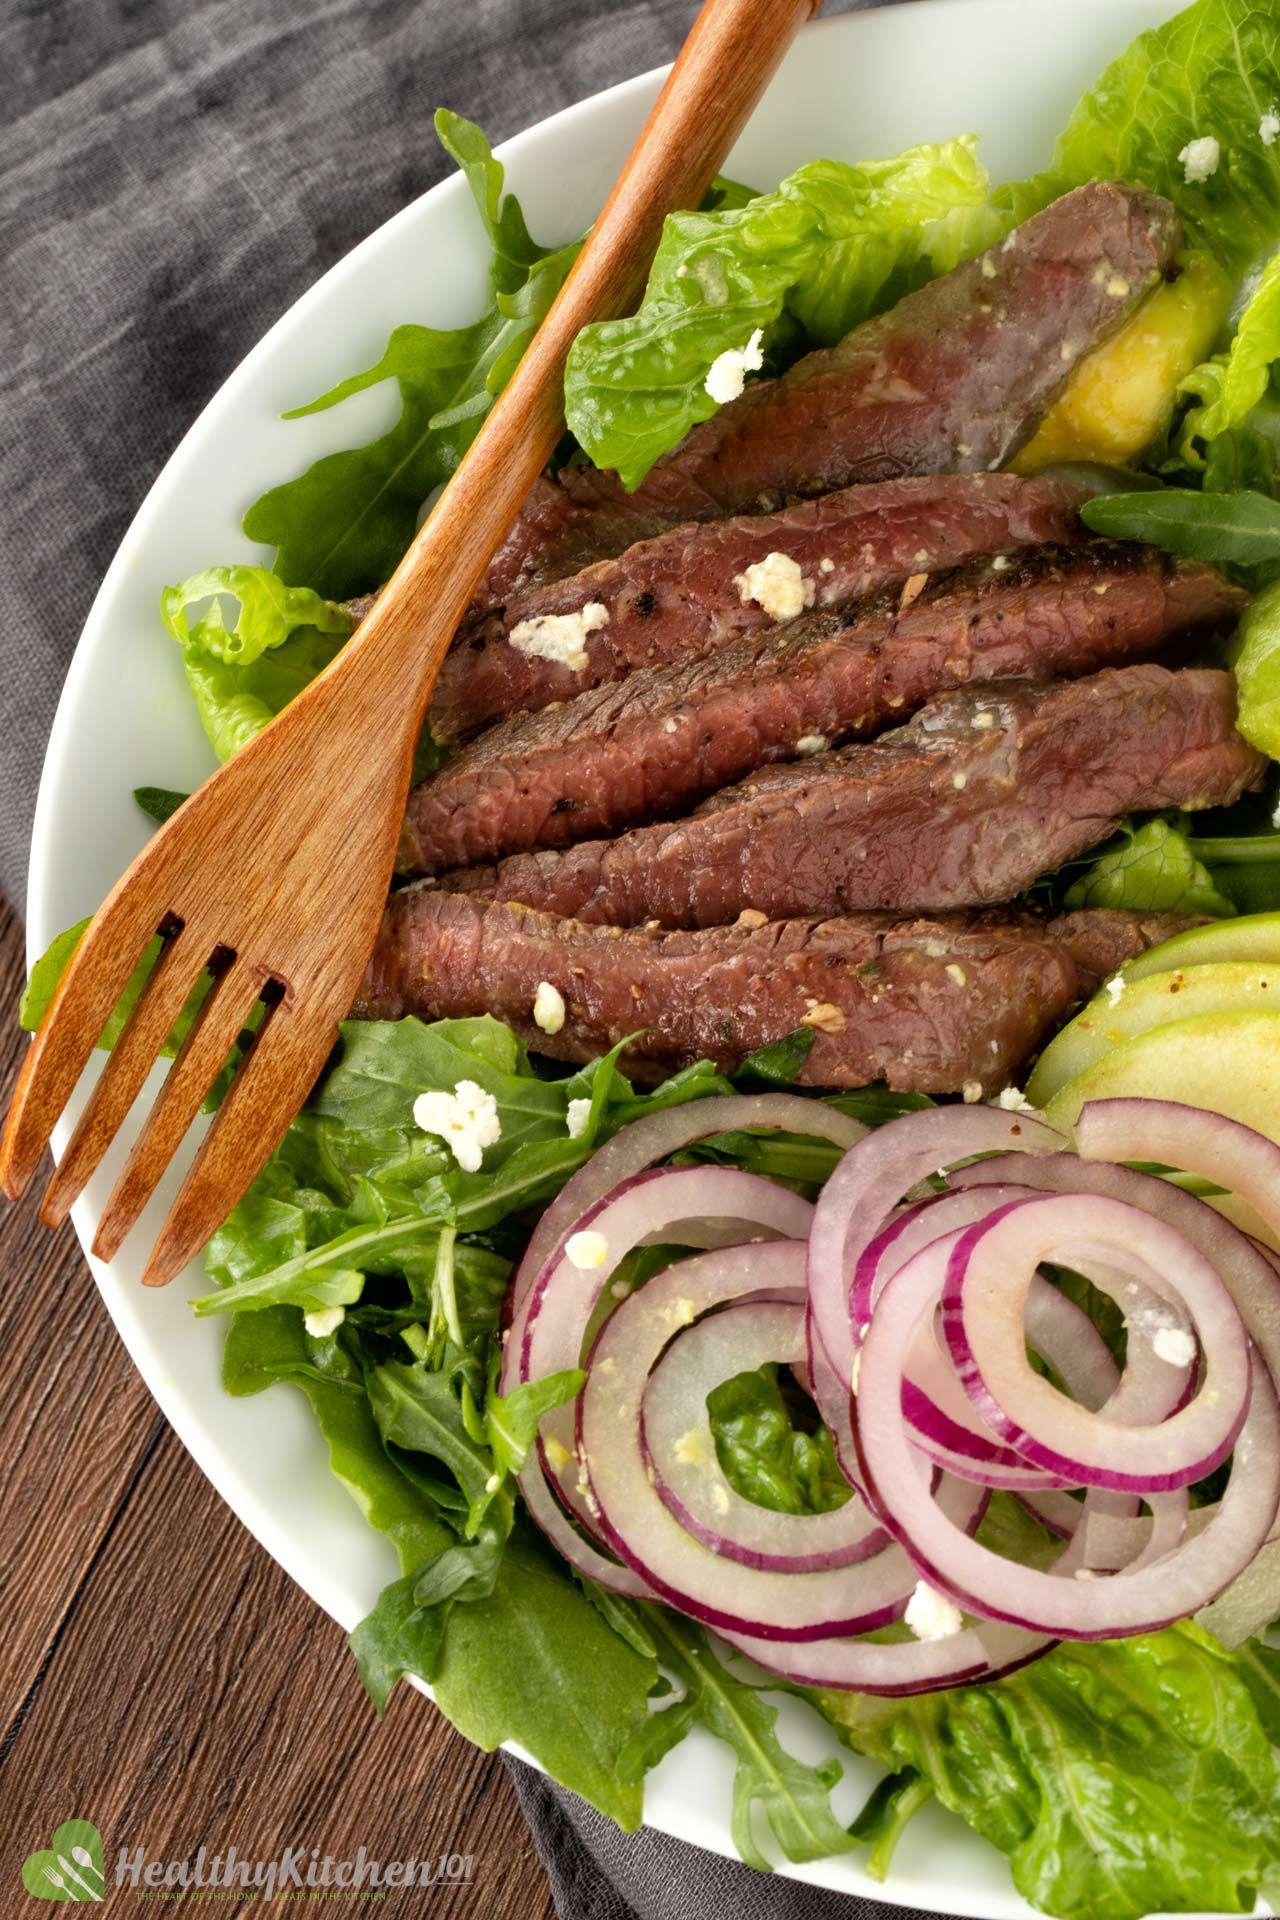 What Kind of Steak Cut Good For Steak Salad